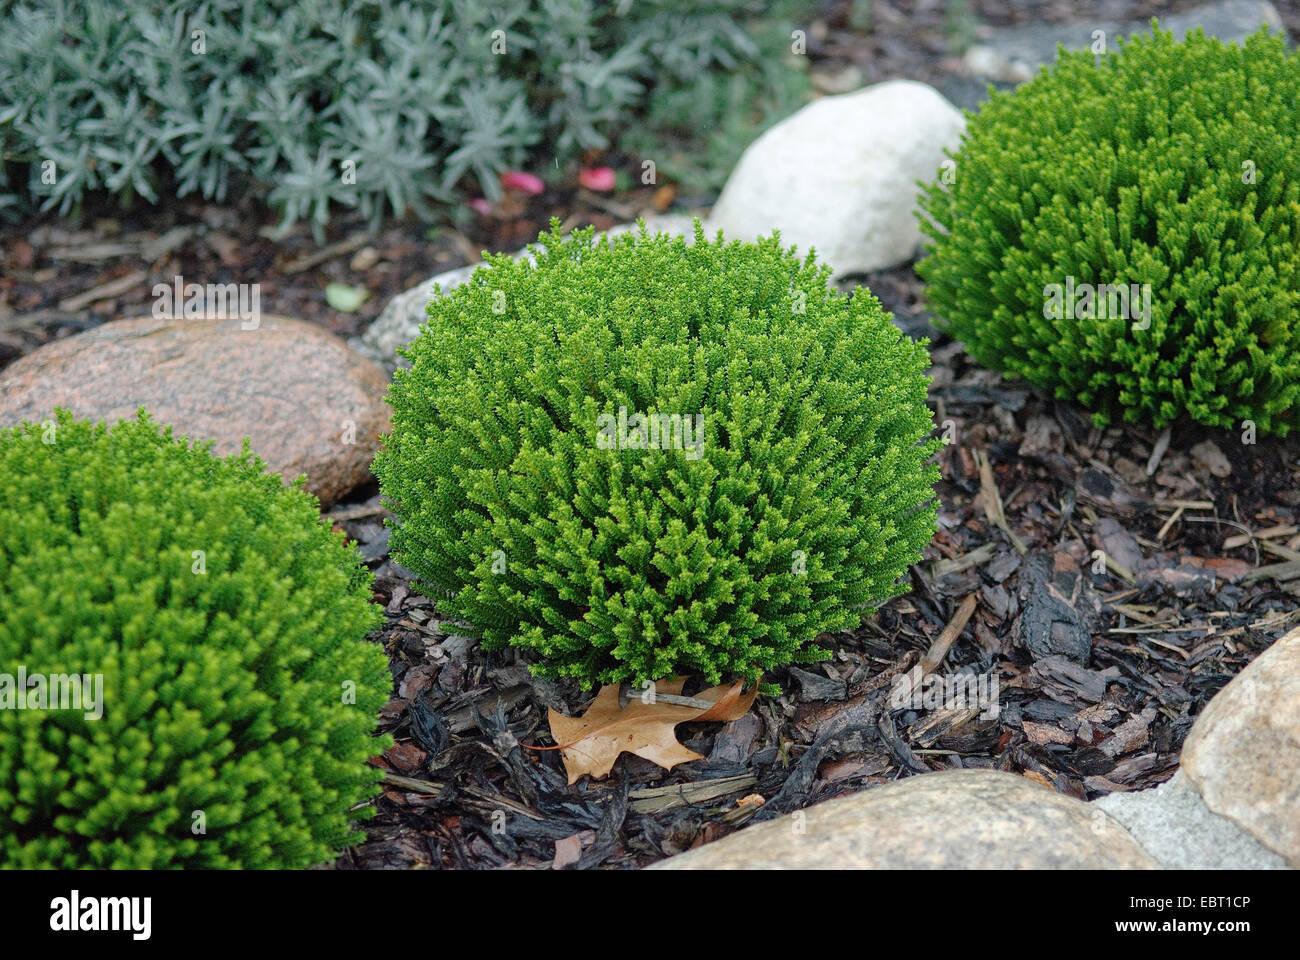 hebe, speedwell (Hebe 'Emerald Gem', Hebe Emerald Gem), cultivar Emerald Gem - Stock Image